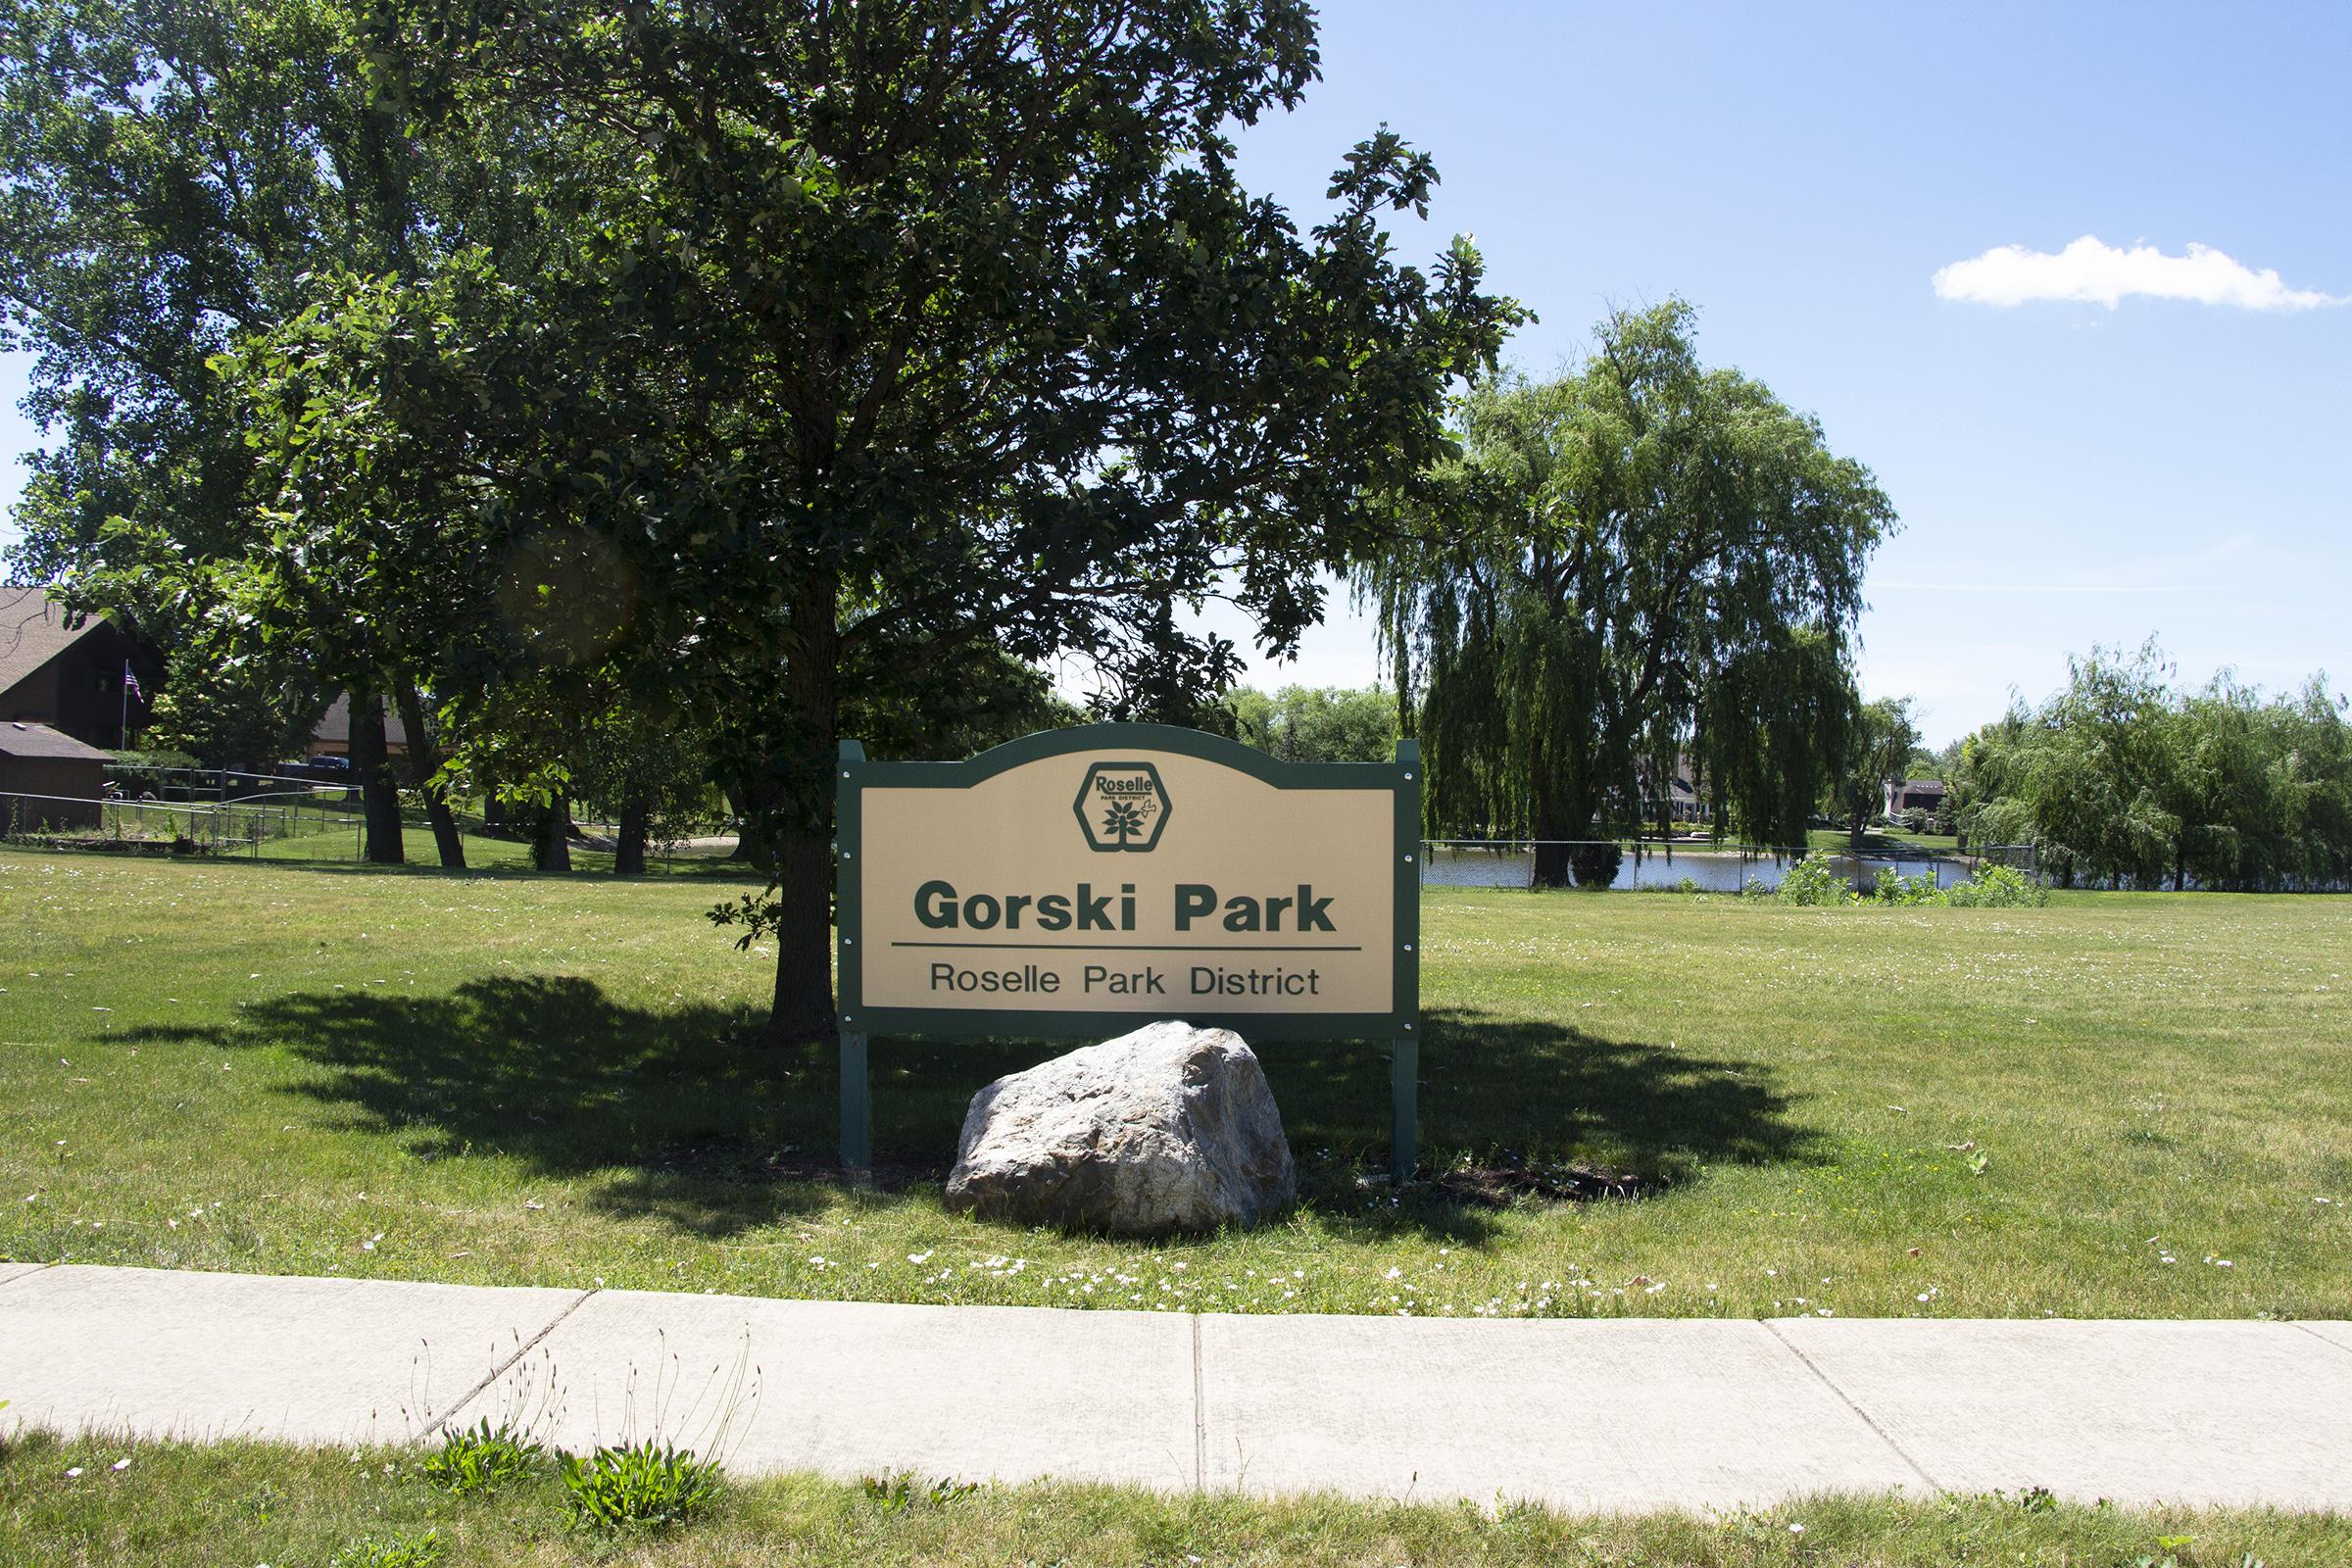 Gorski Park